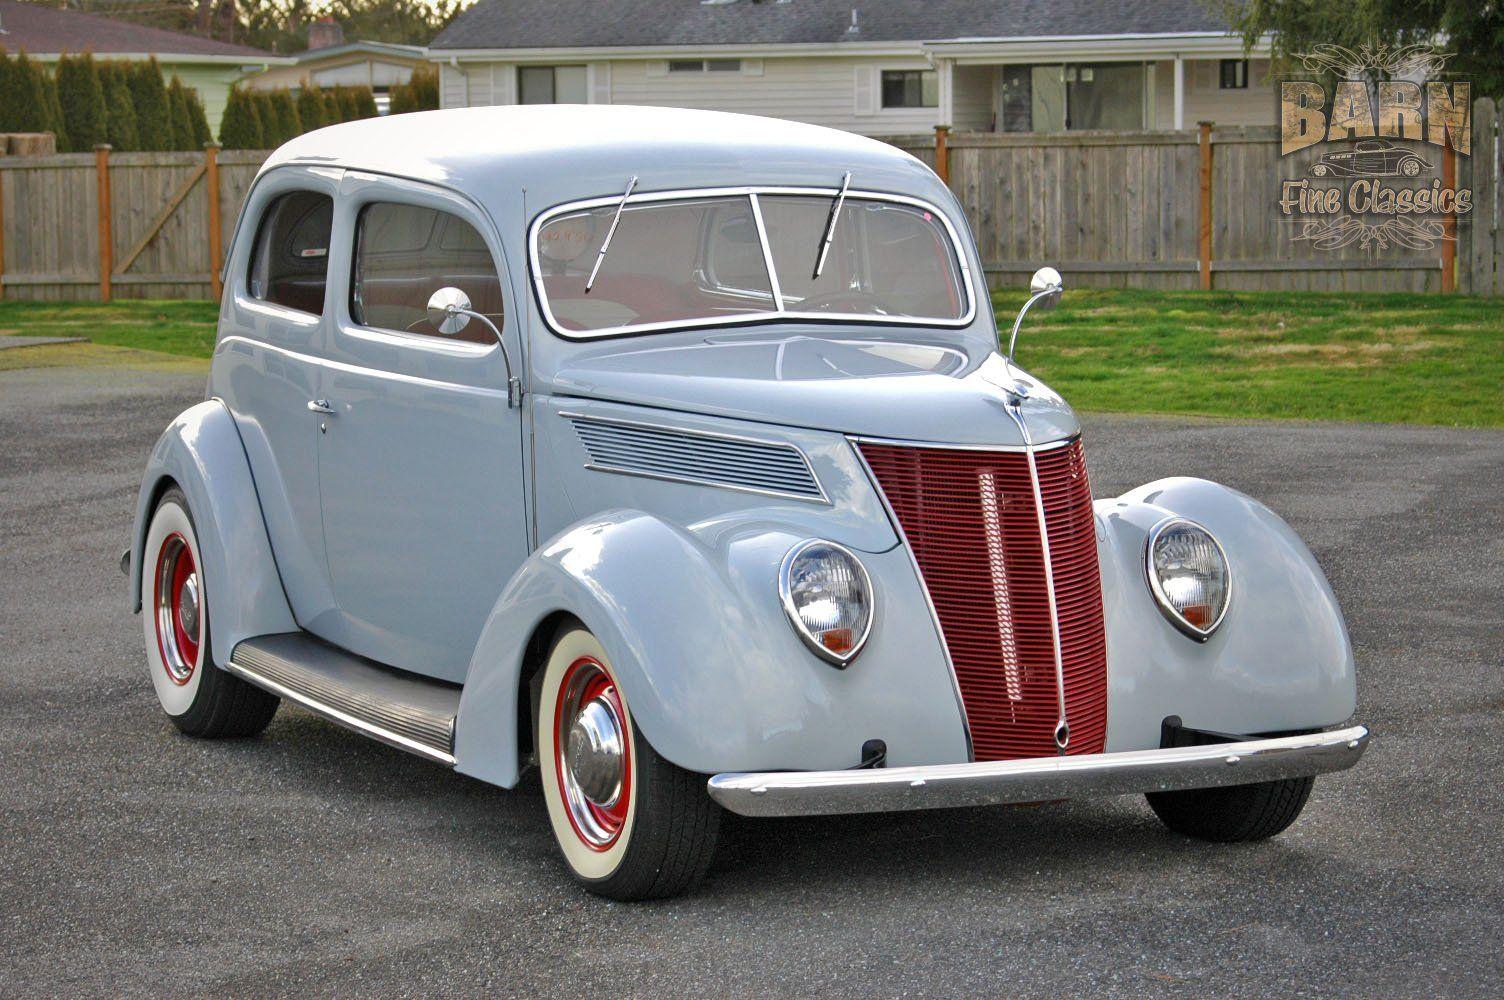 1937 Ford Sedan 2 Door Slantback Hotrod Hot Rod Old School USA ...